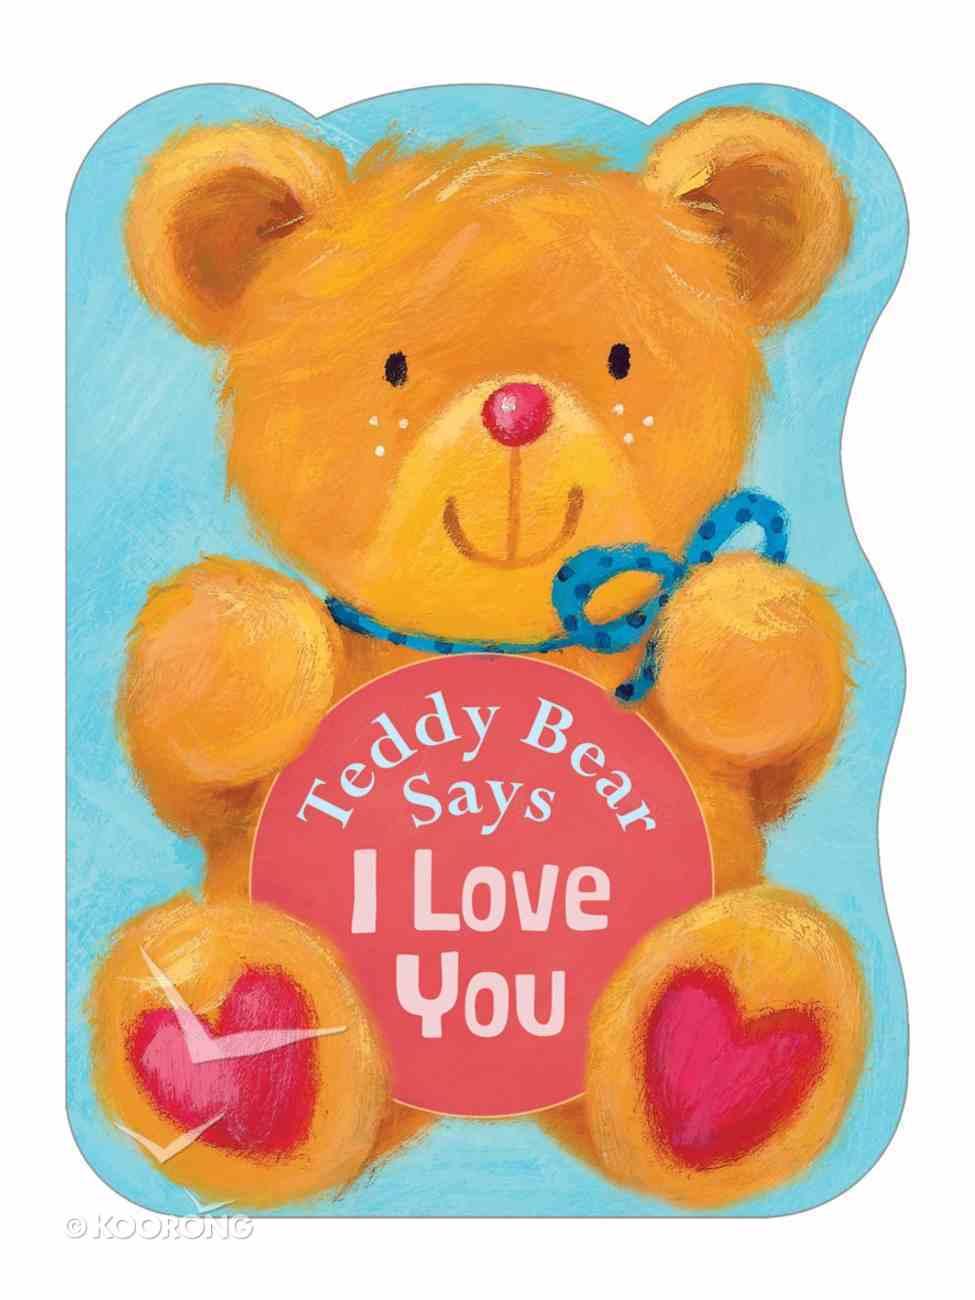 Teddy Bear Says I Love You Board Book